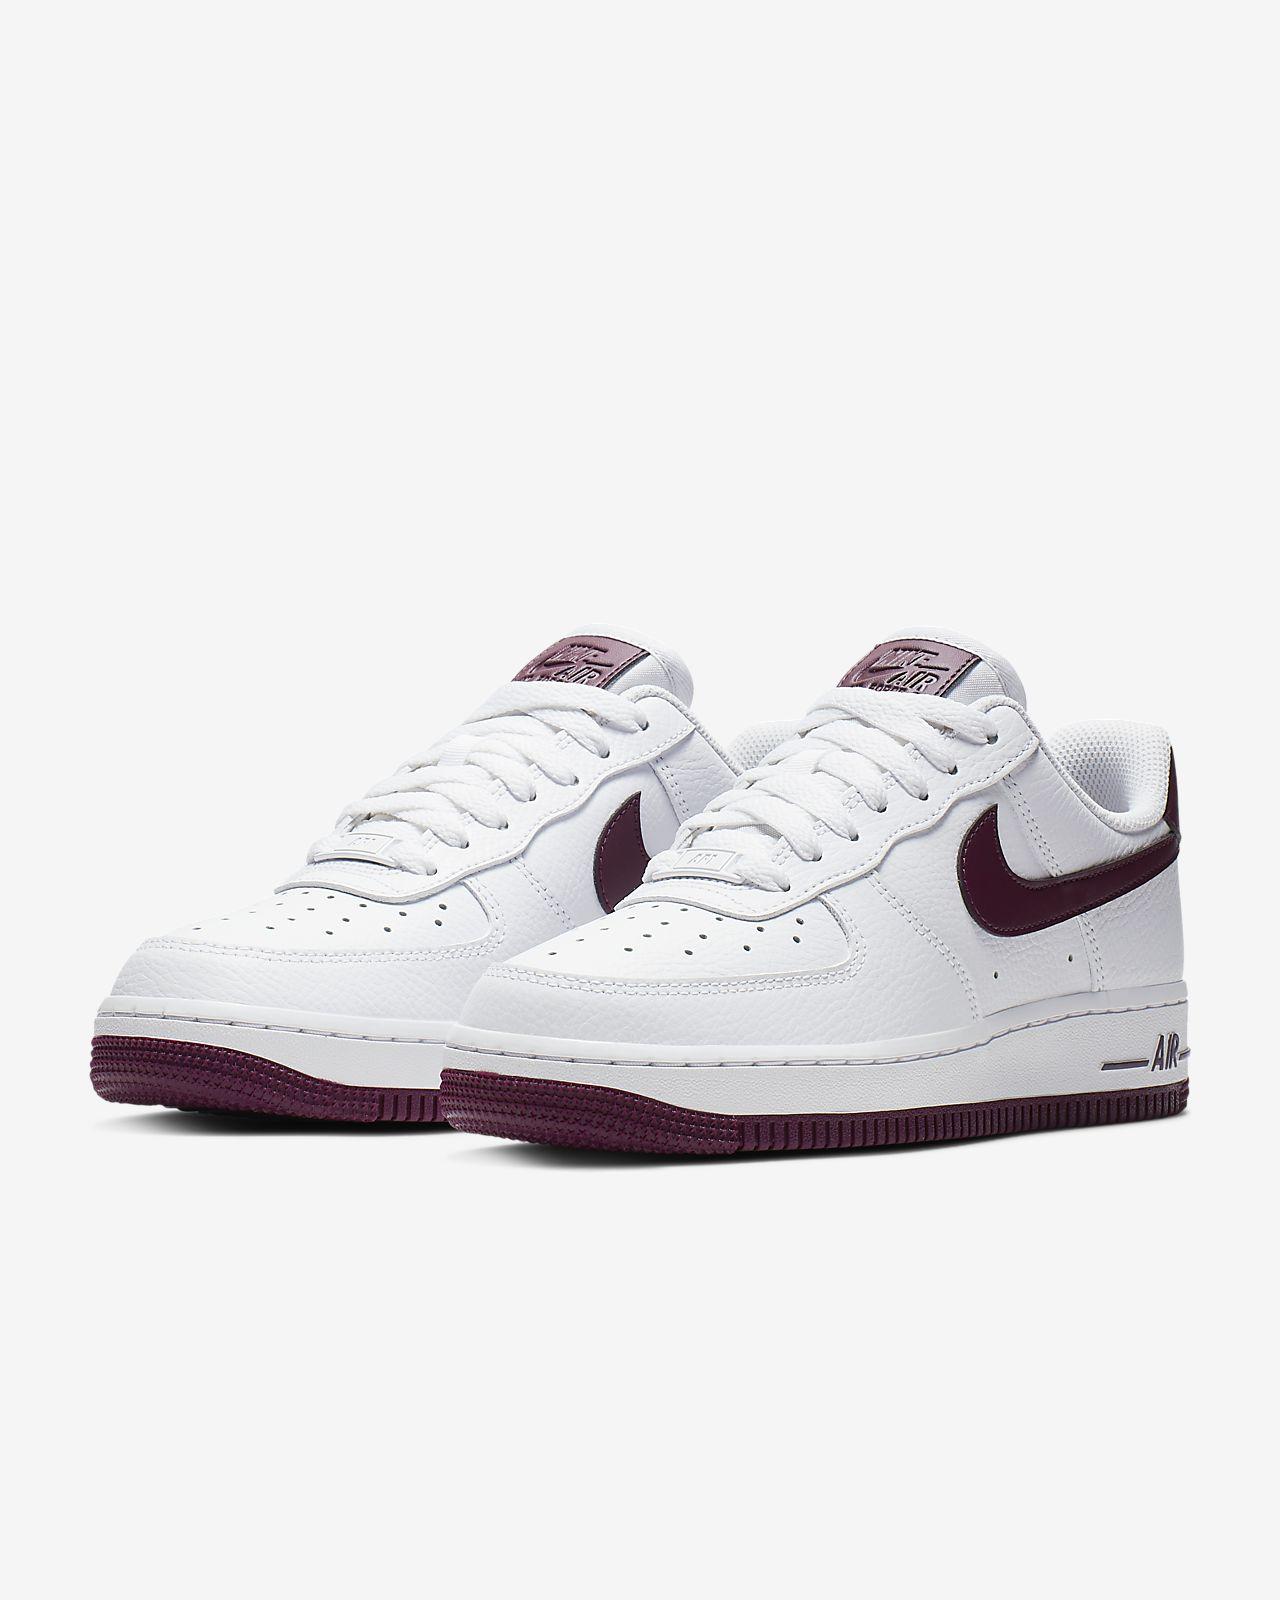 8554066ff3d Nike Air Force 1 '07 Patent Women's Shoe. Nike.com DK